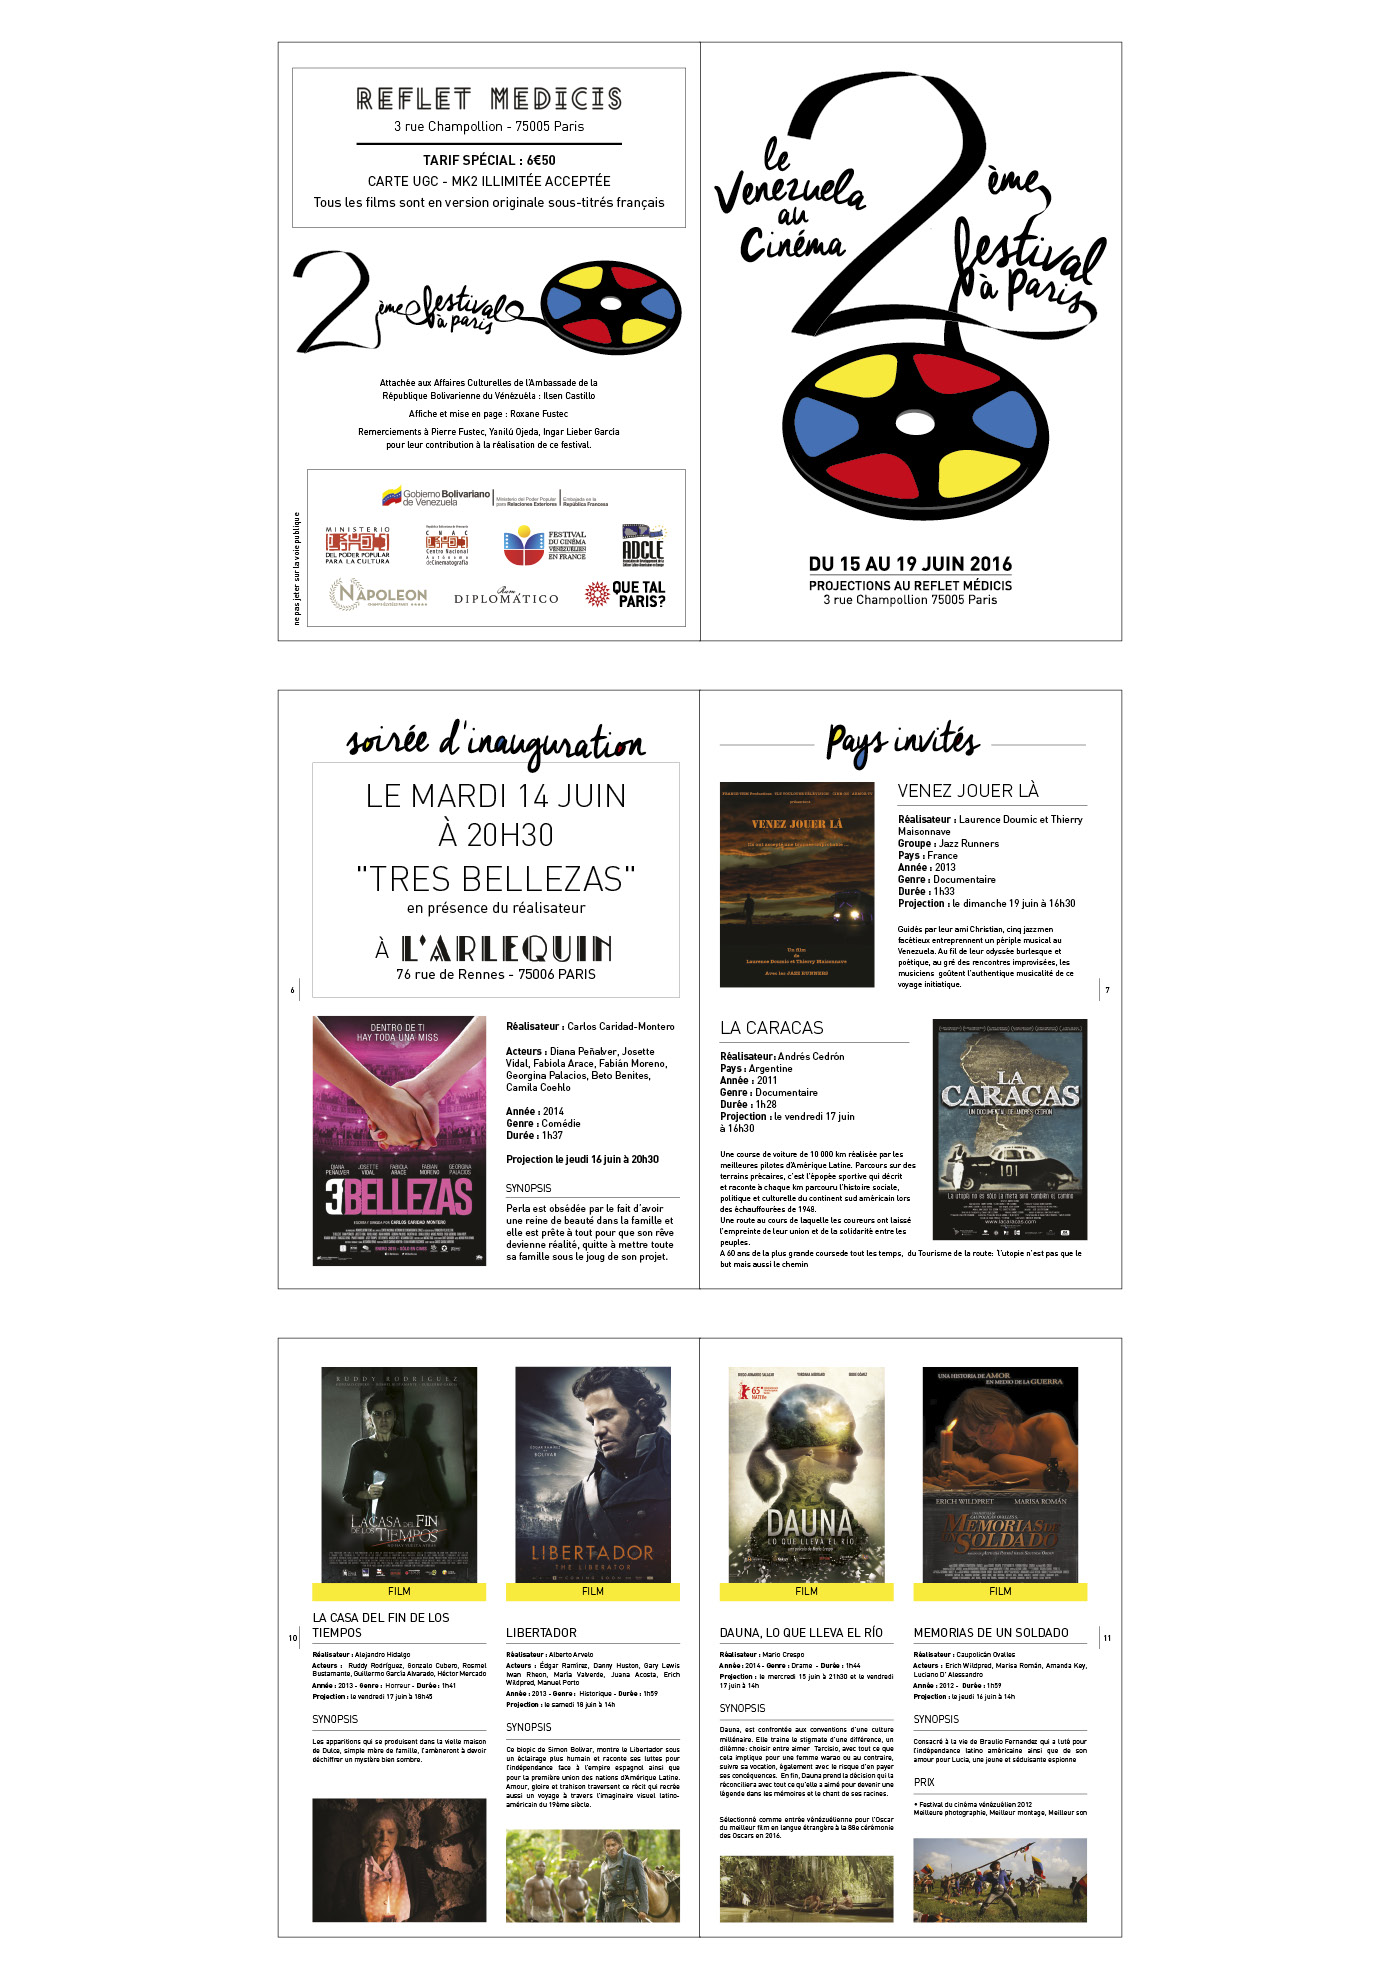 Festival_2016 - Programme